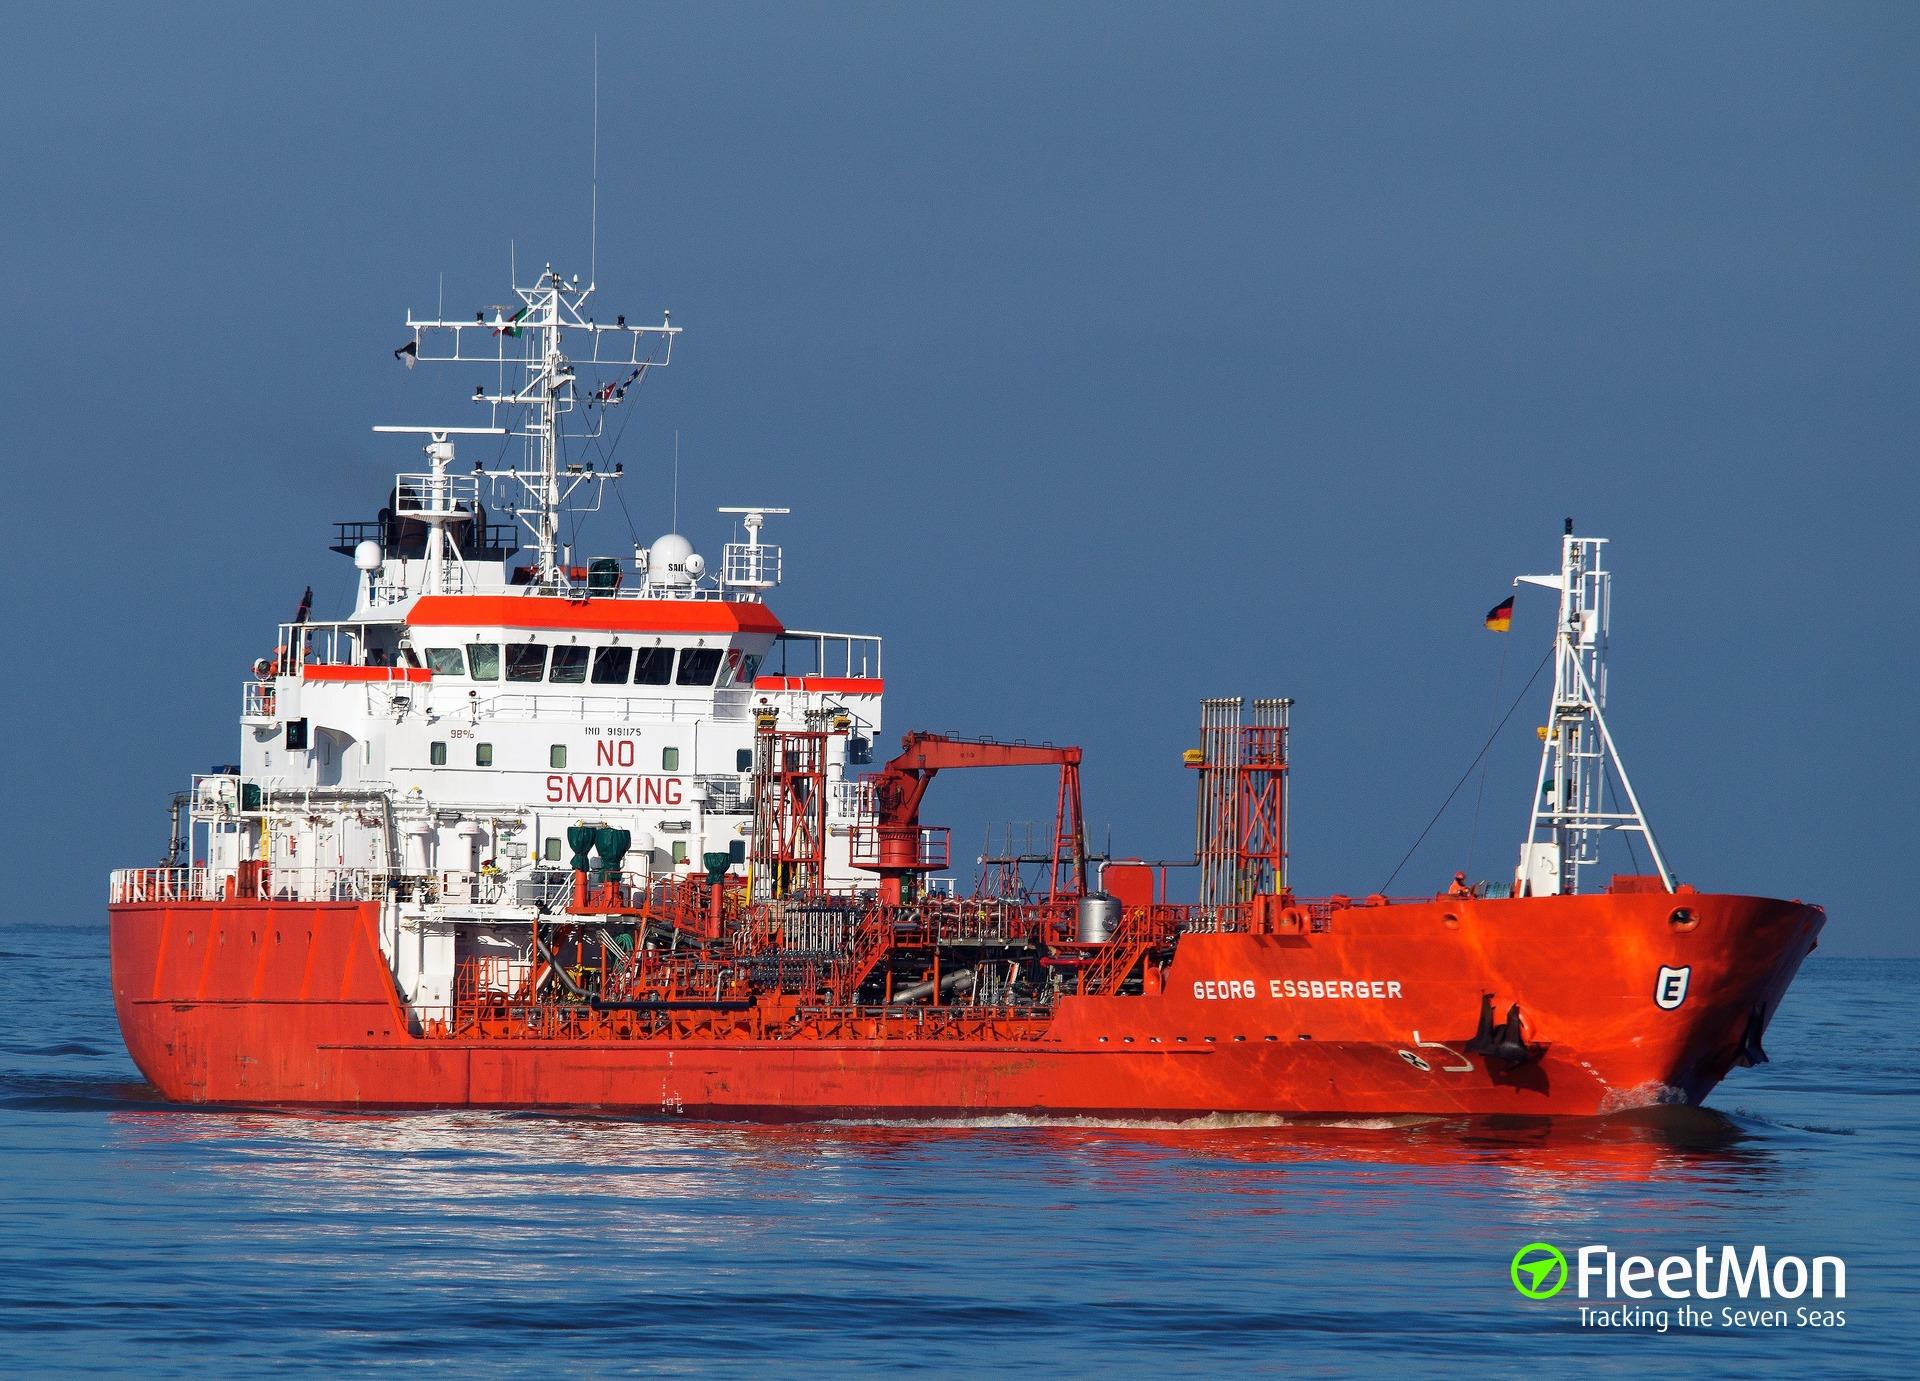 Product tanker GEORG ESSBERGER damaged in allision